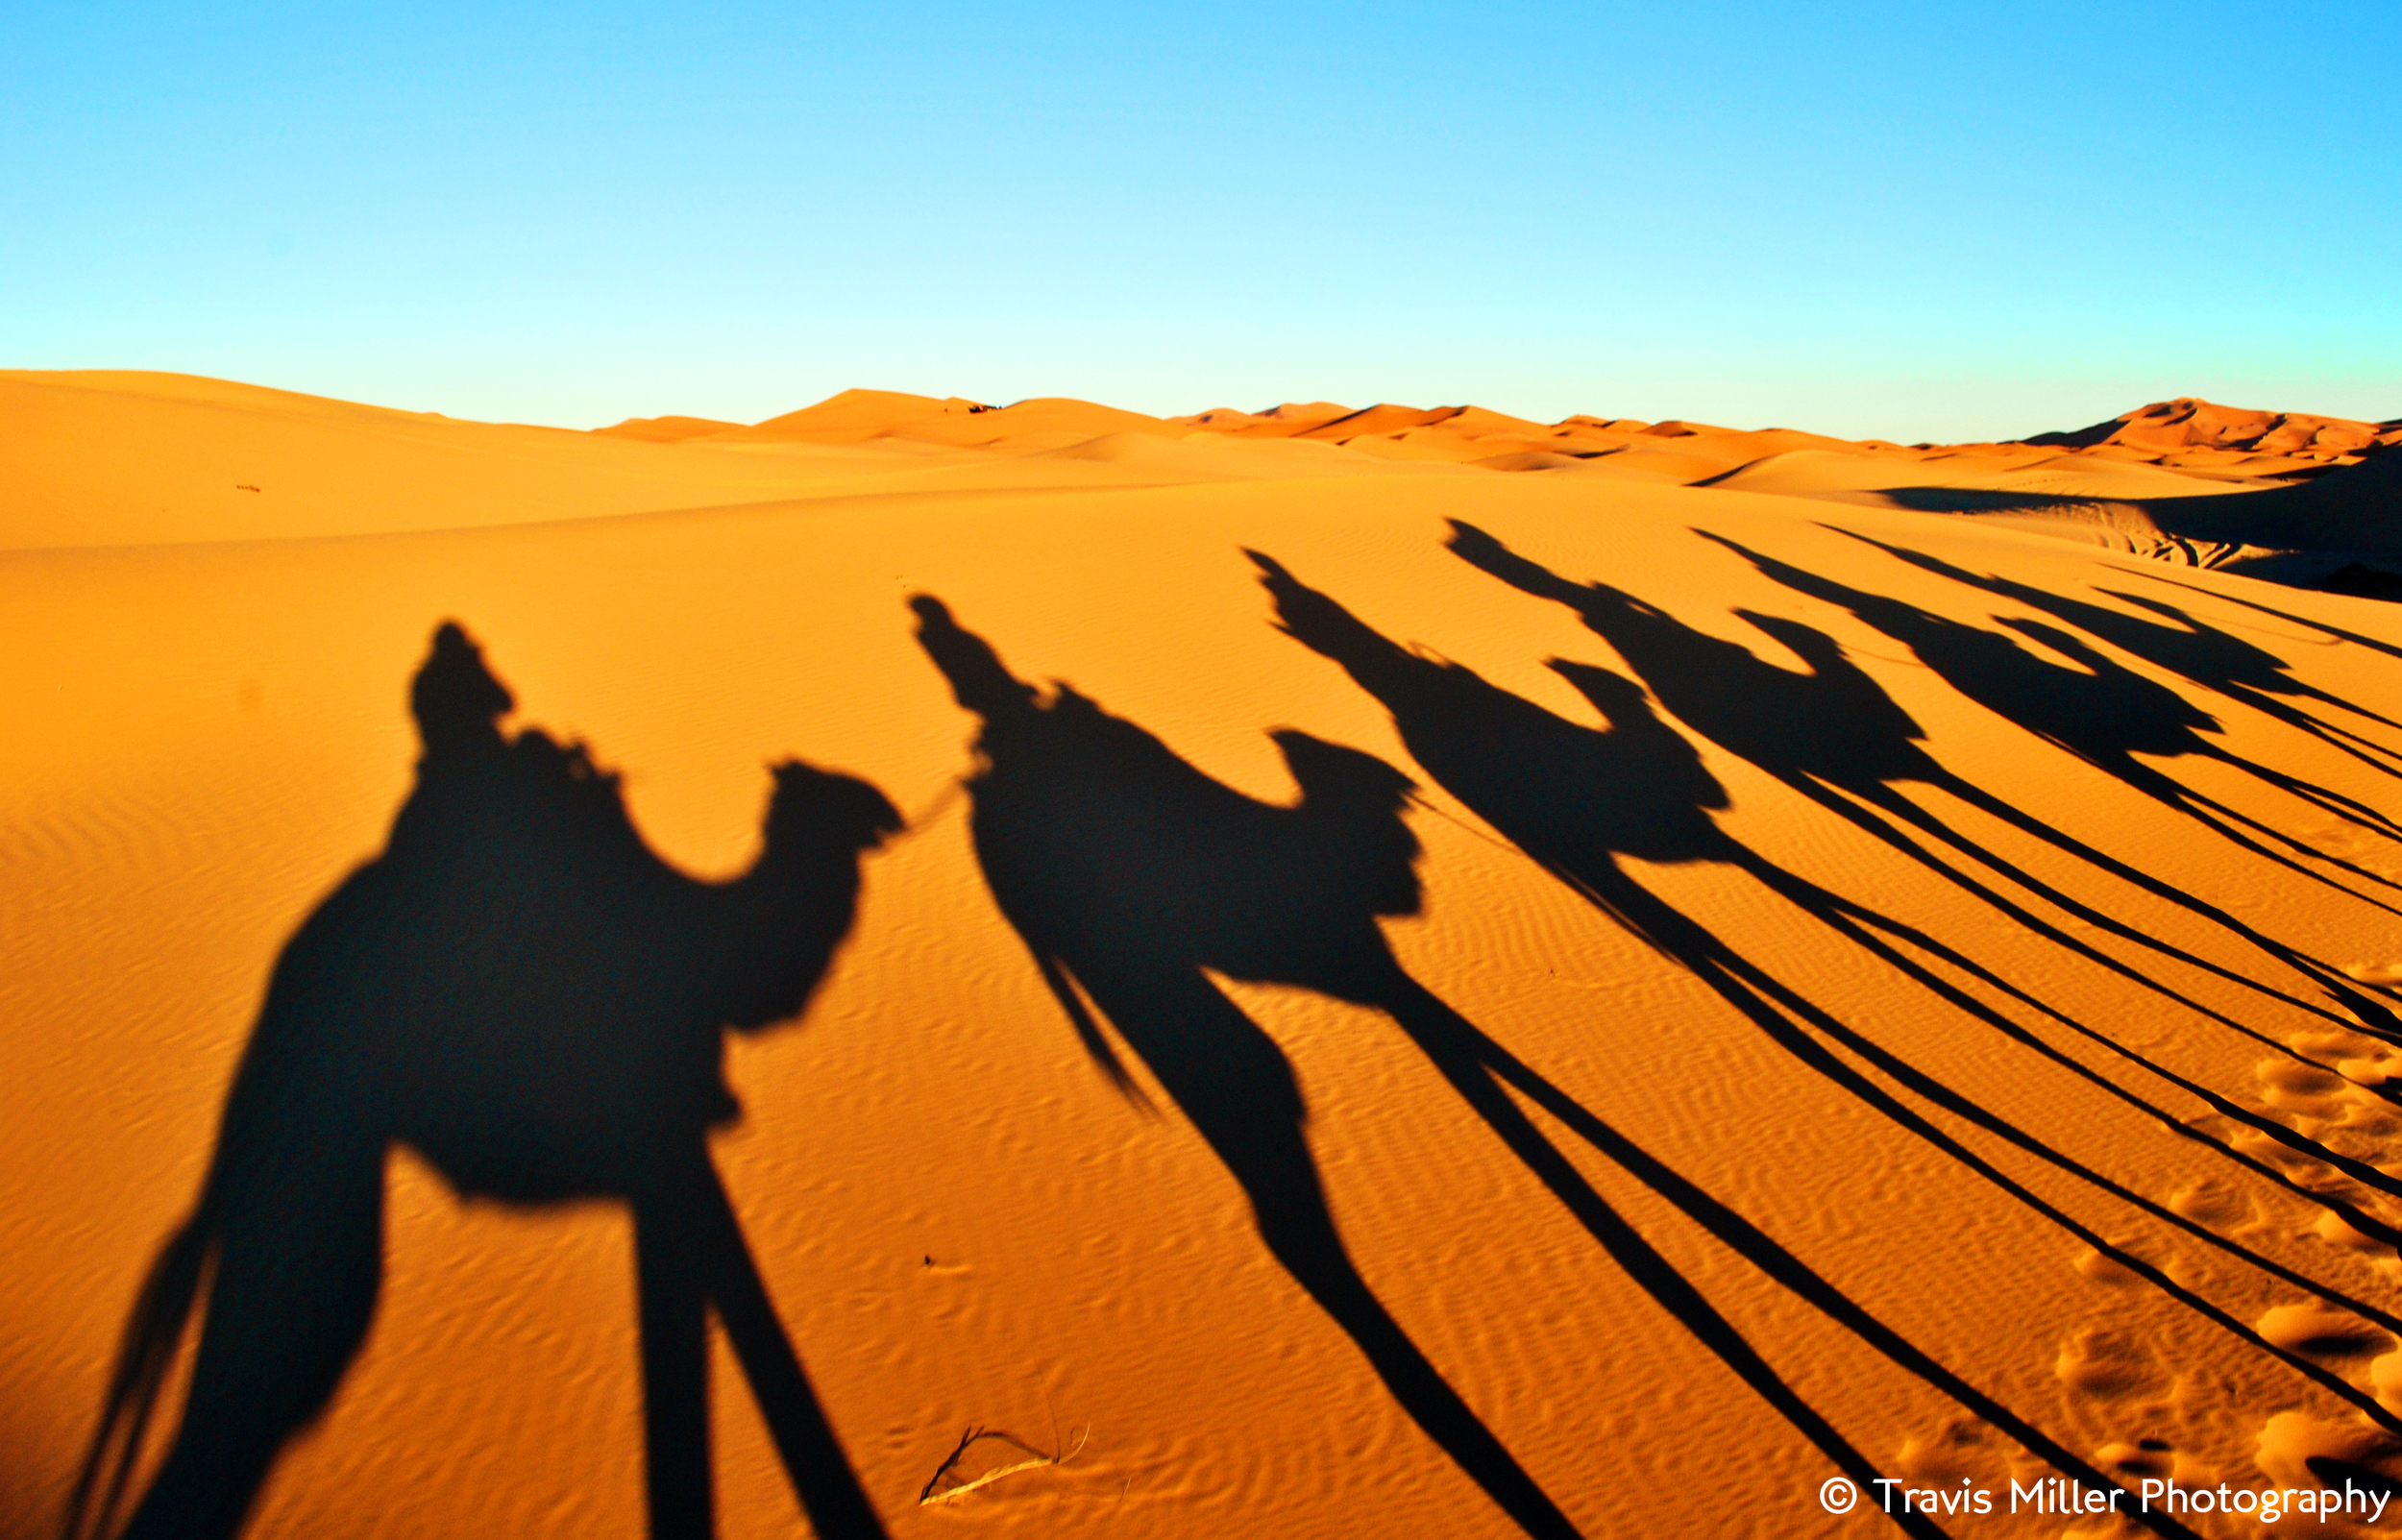 Caravan /  Saharan Desert, Morocco